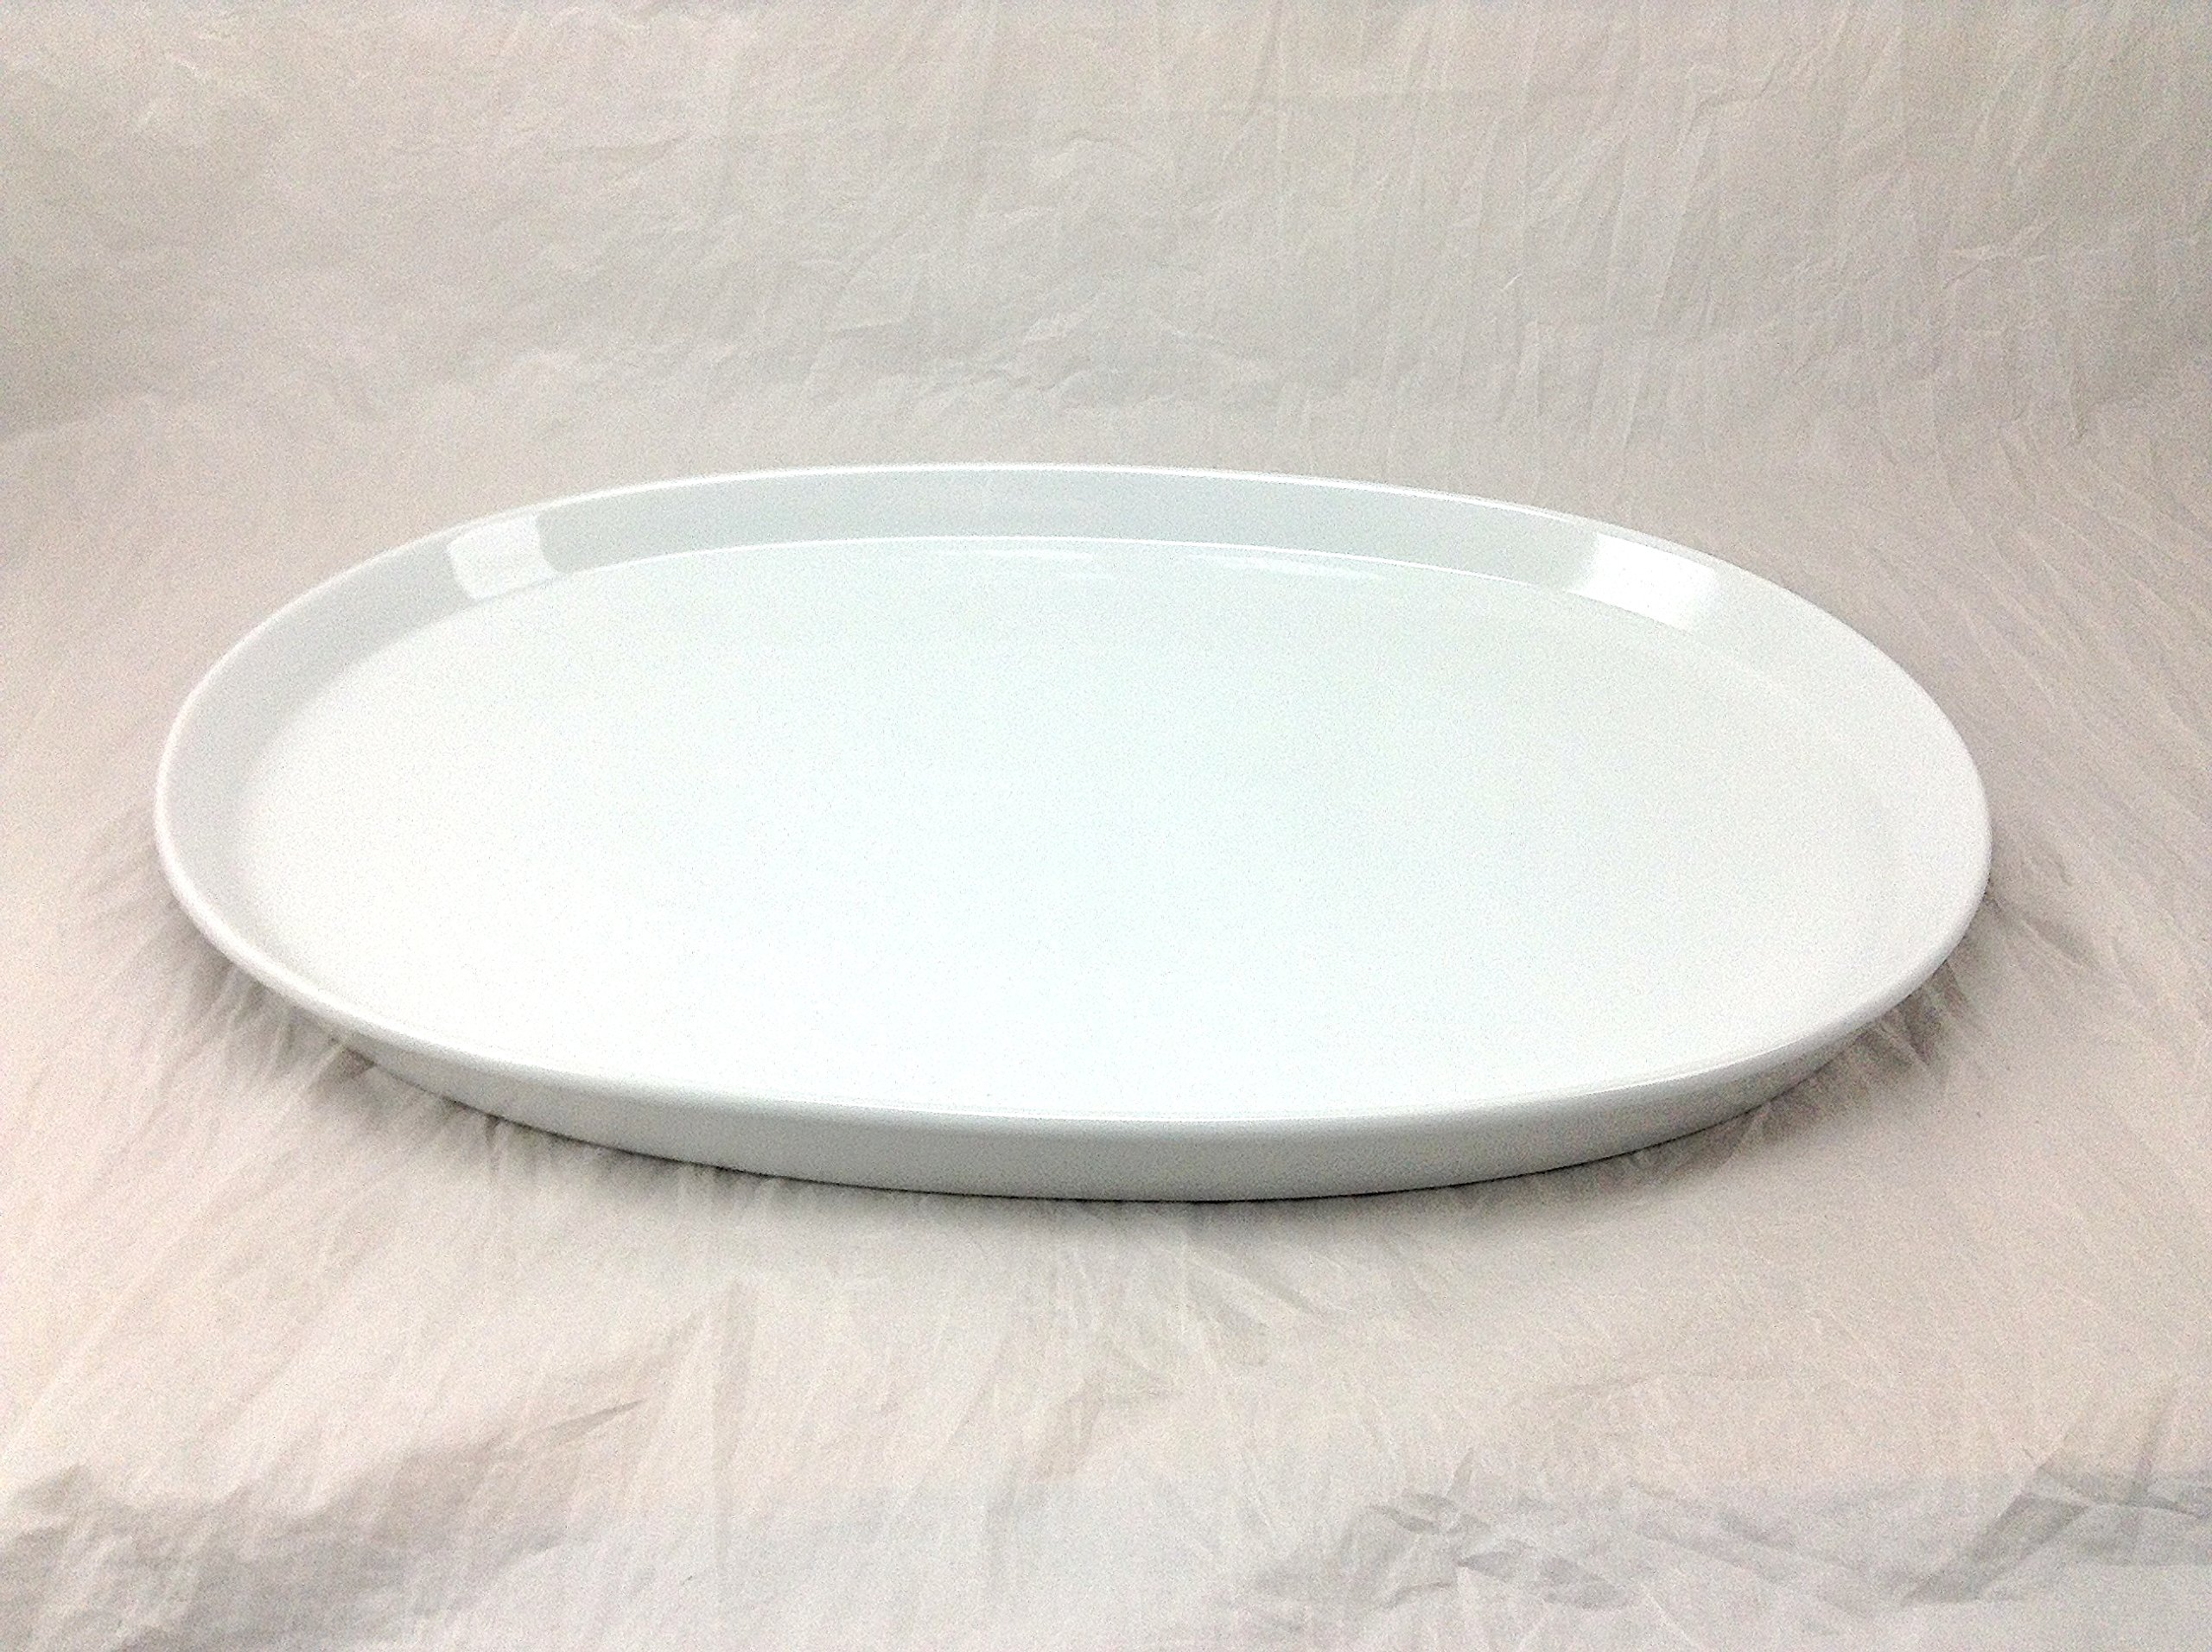 BIA Cordon Bleu 906062 21 by 14-Inch Oval White Porcelain Serving Platter, Large